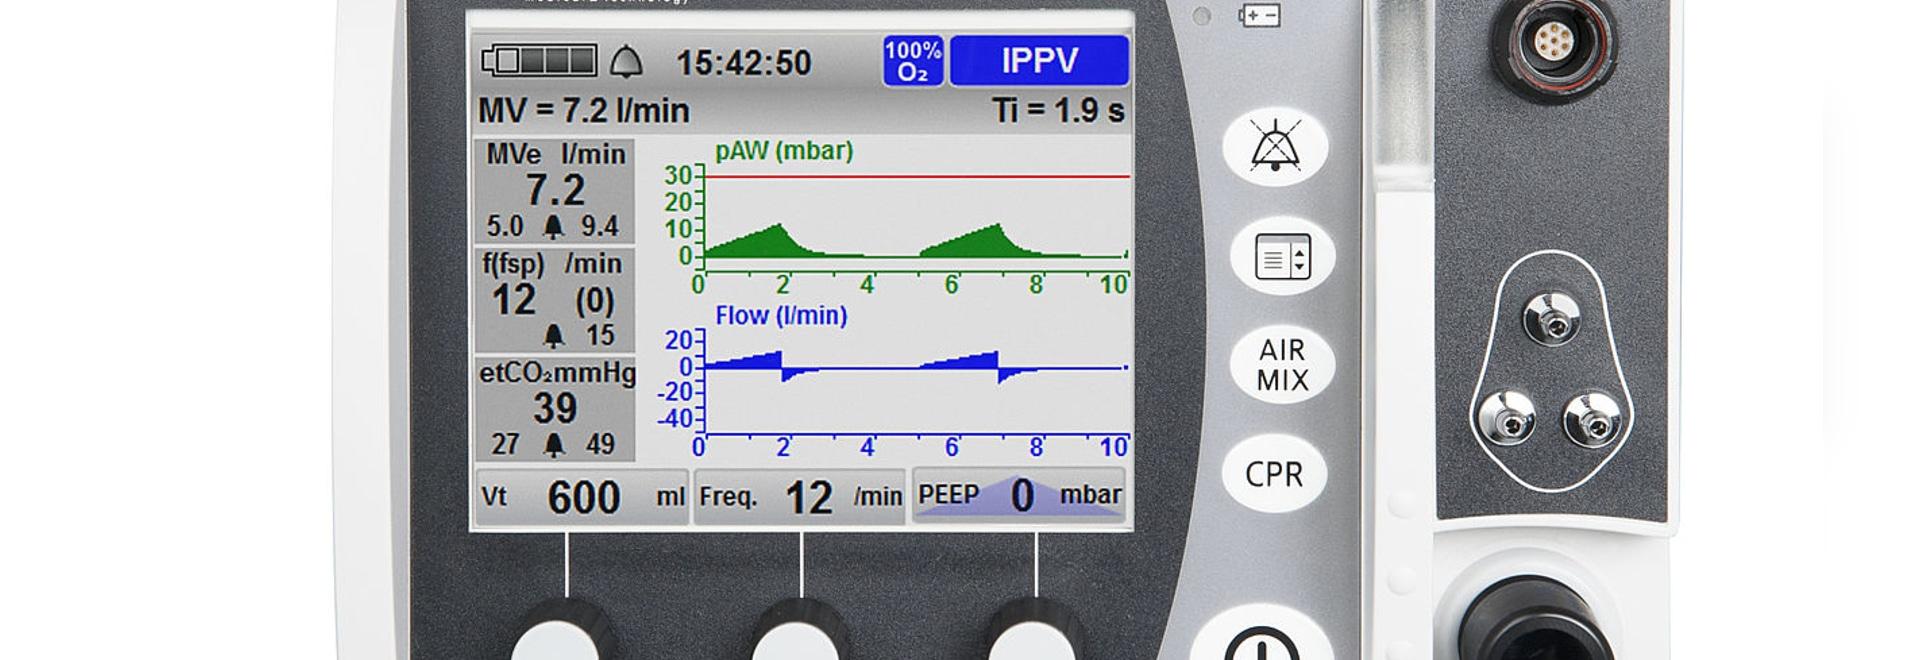 MEDUMAT Standard² – Emergency Ventilator with new Options